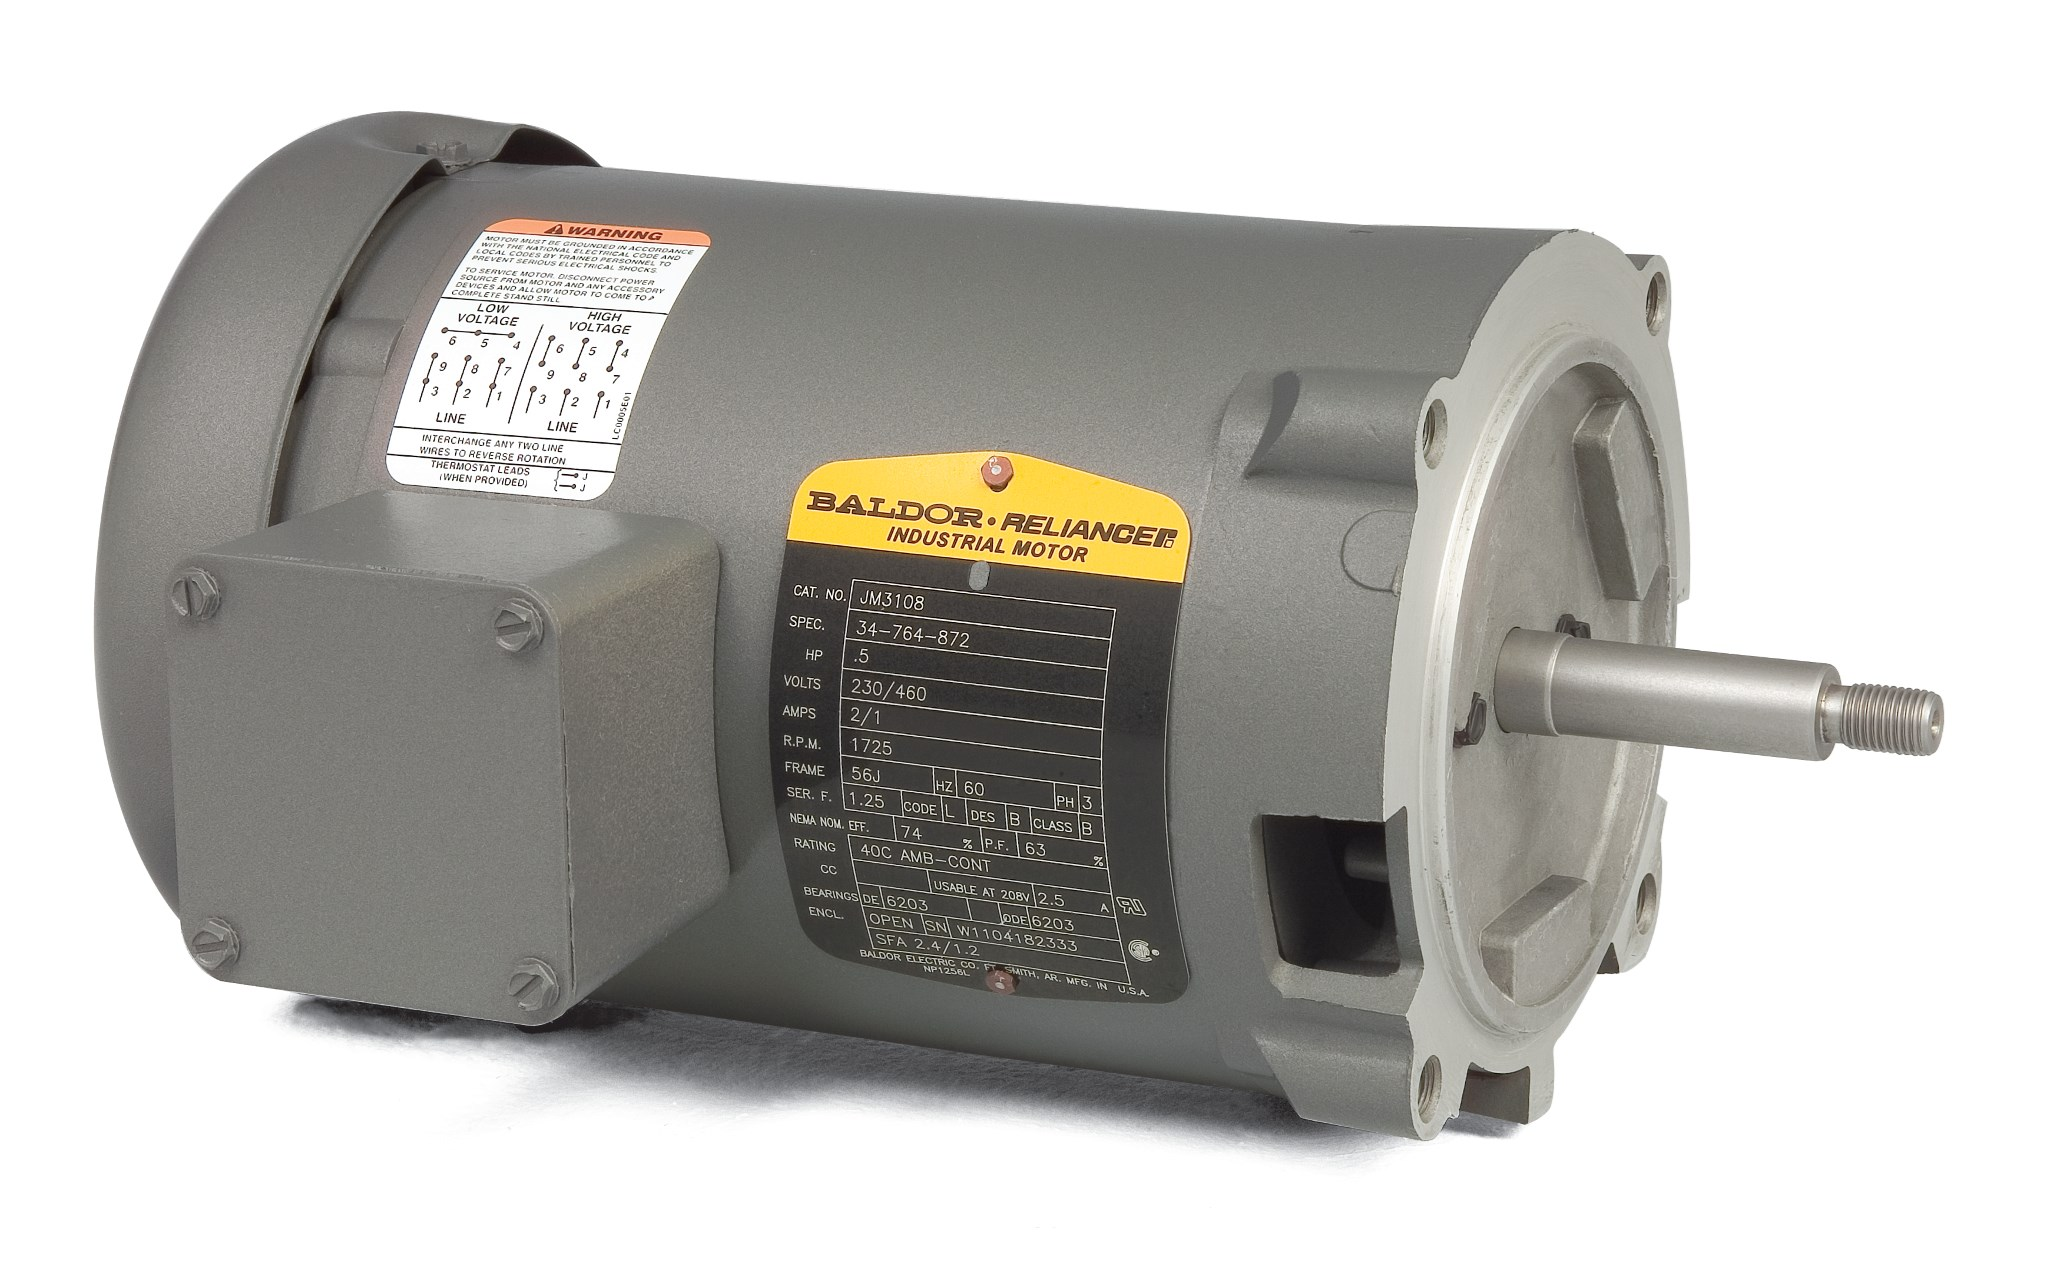 Baldor Electric Motor Wiring Diagrams 10 0 Amb Cont Detailed Jm3154 Product Catalog Com